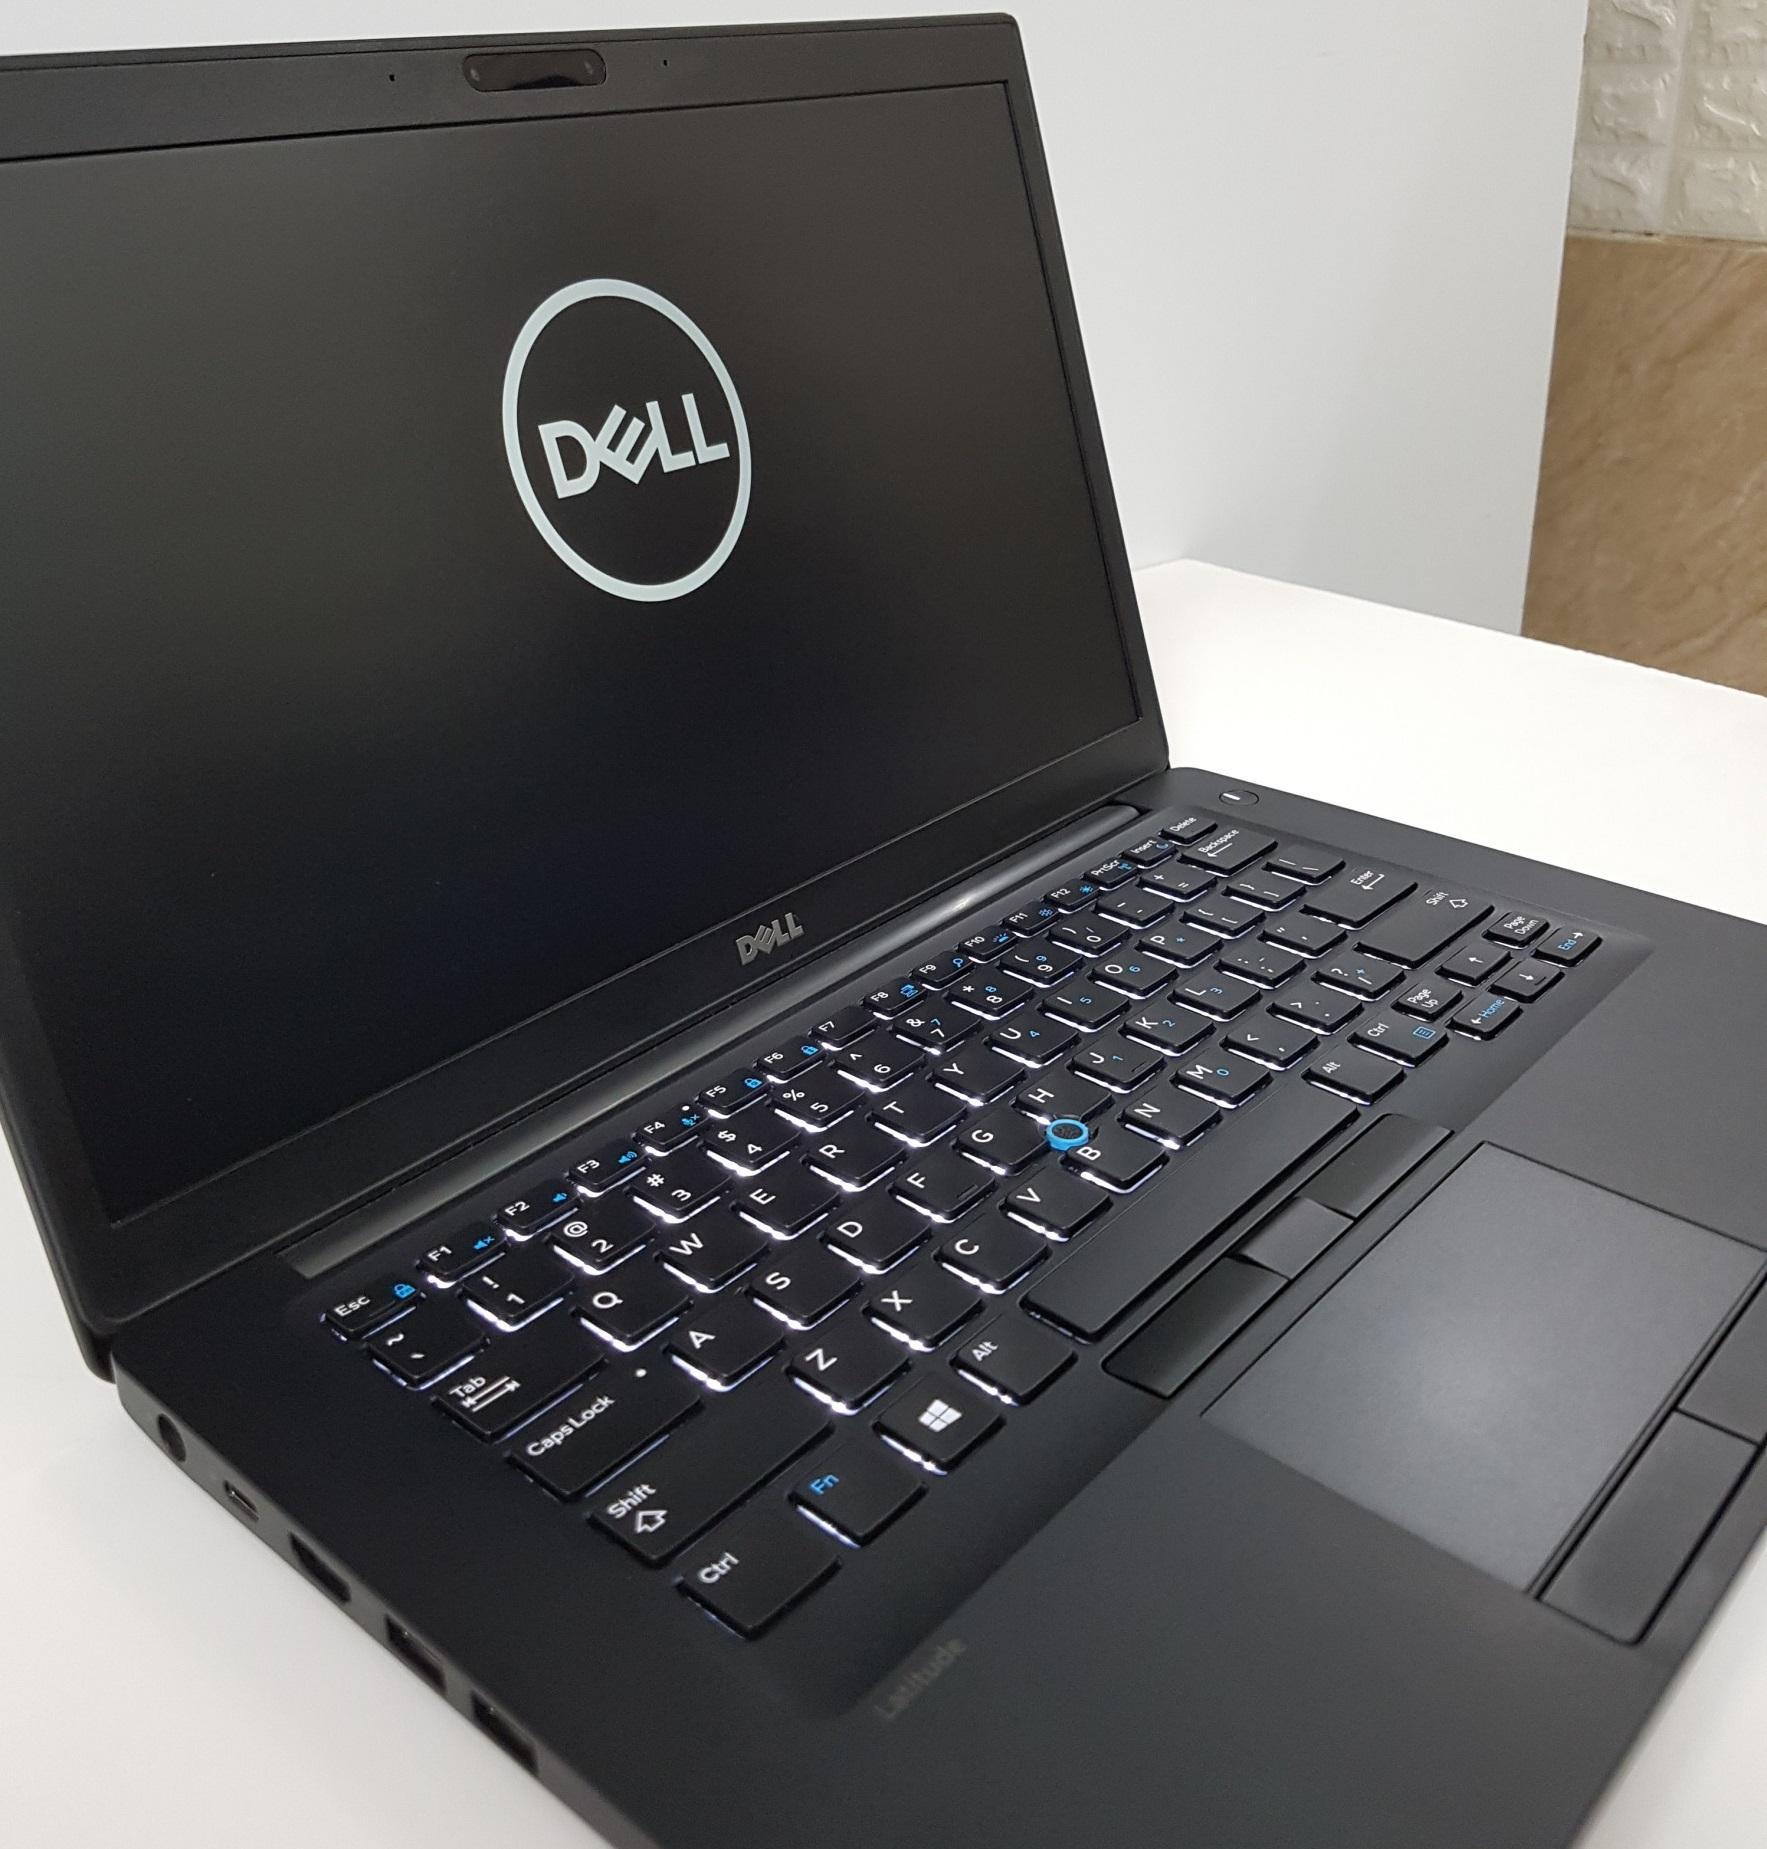 Dell Latitude 7480 core i5-6300U / Ram 8G / 256G SSD / Màn 14 inchs Full HD IPS mở khóa khuôn mặt